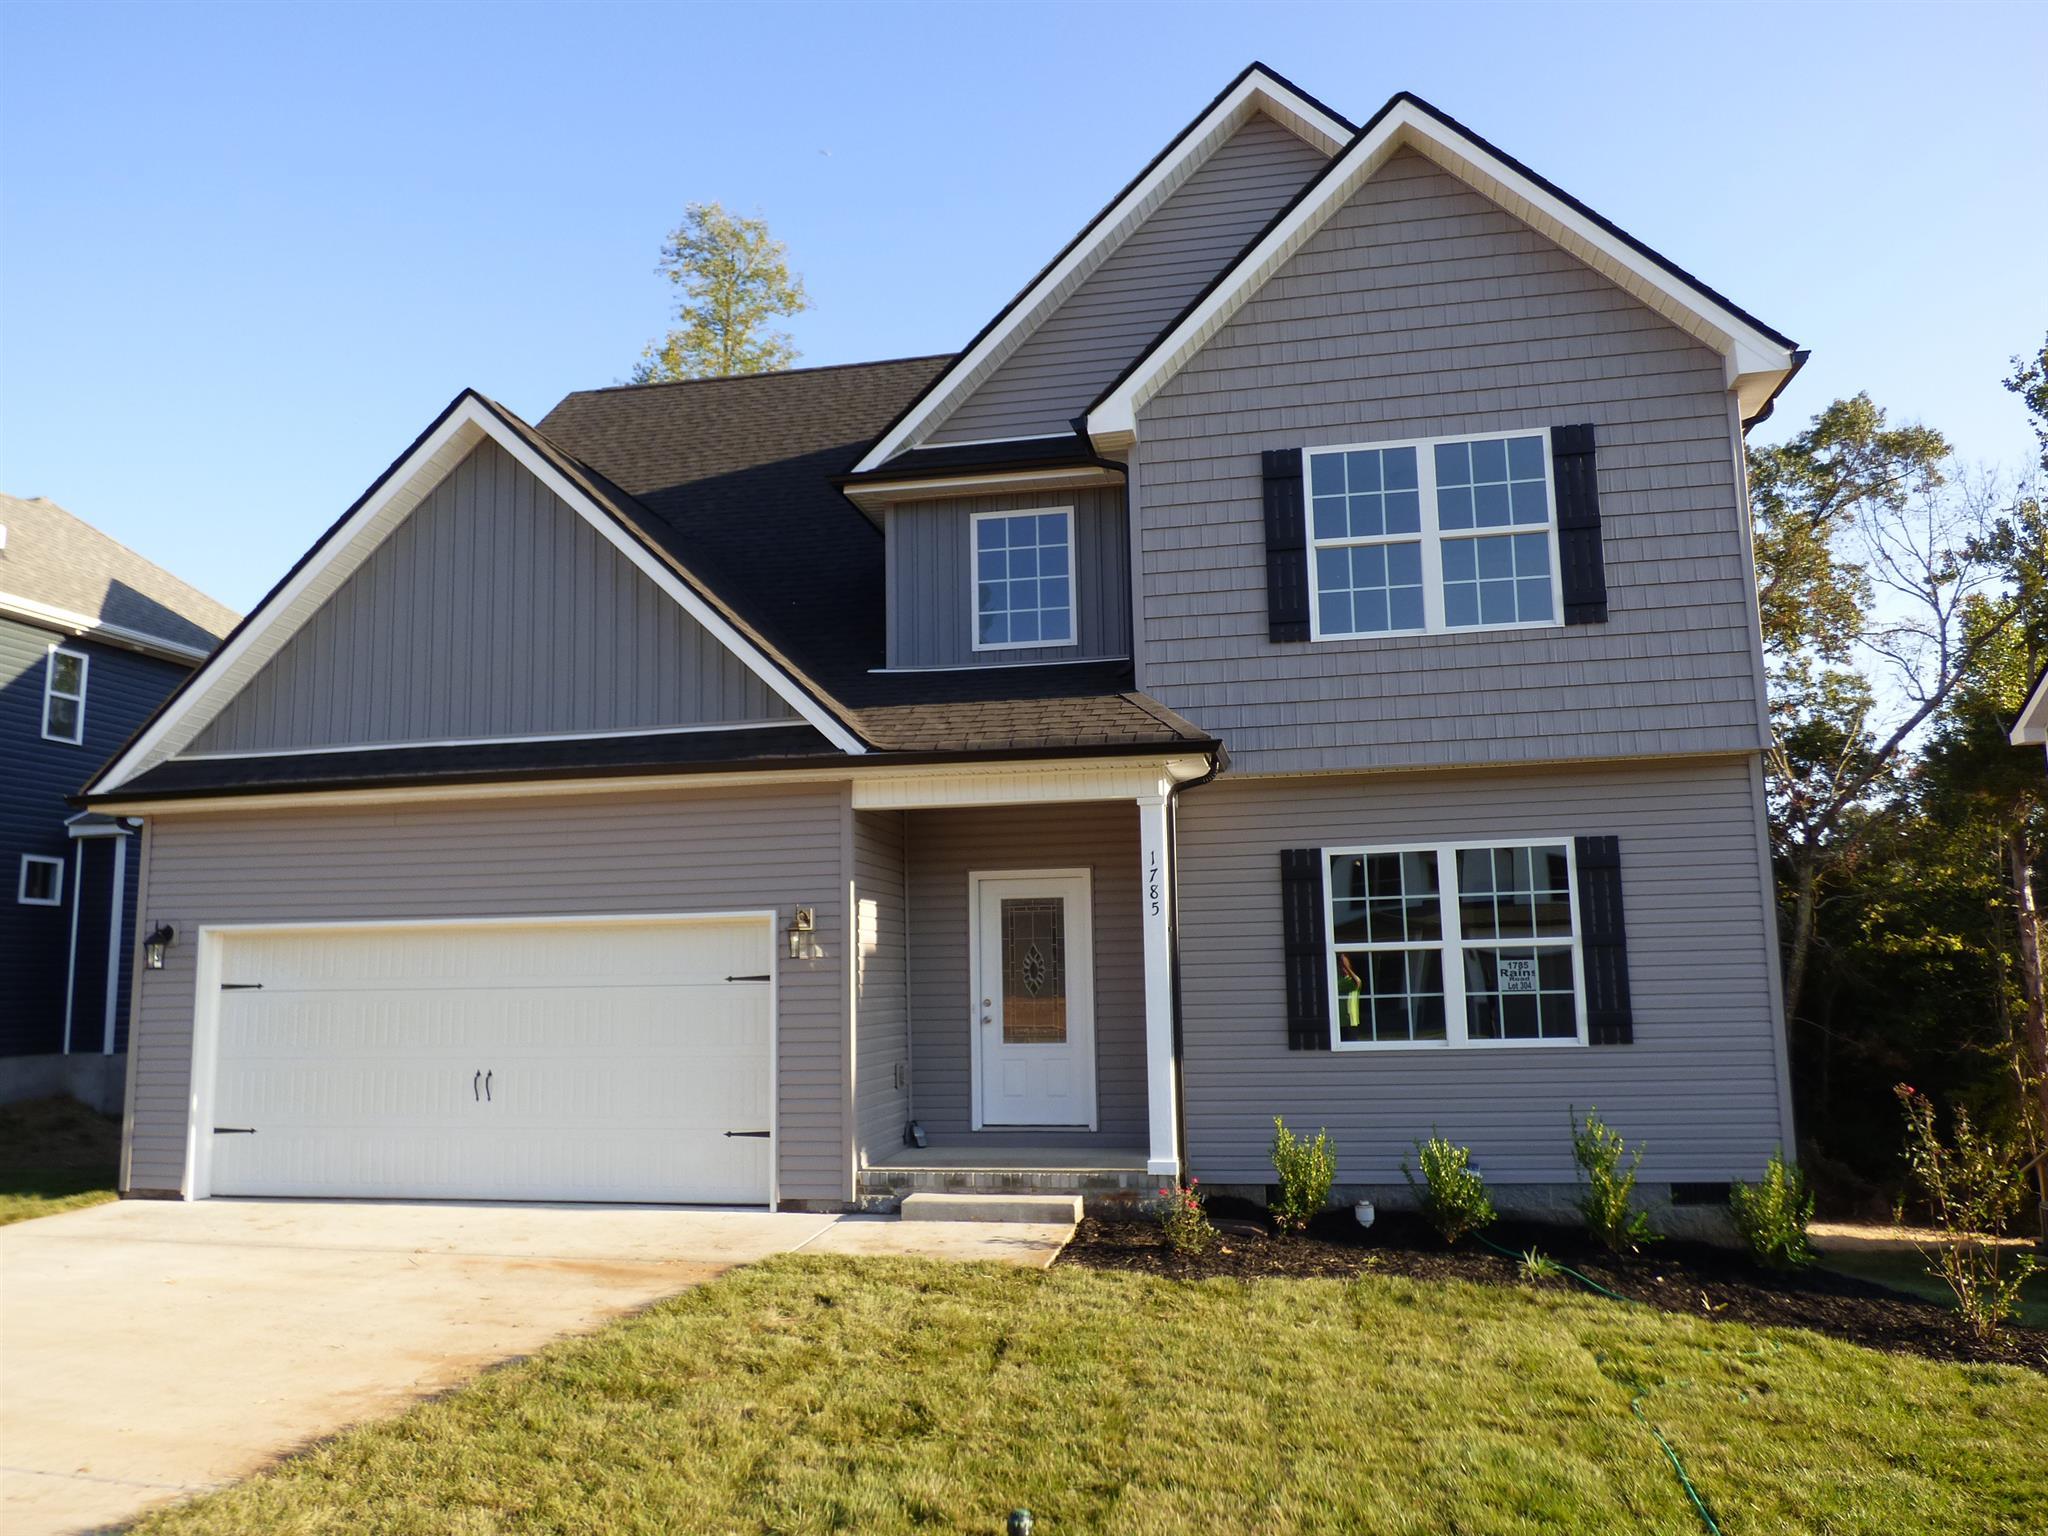 1785 Rains Rd, Clarksville, TN 37042 - Clarksville, TN real estate listing